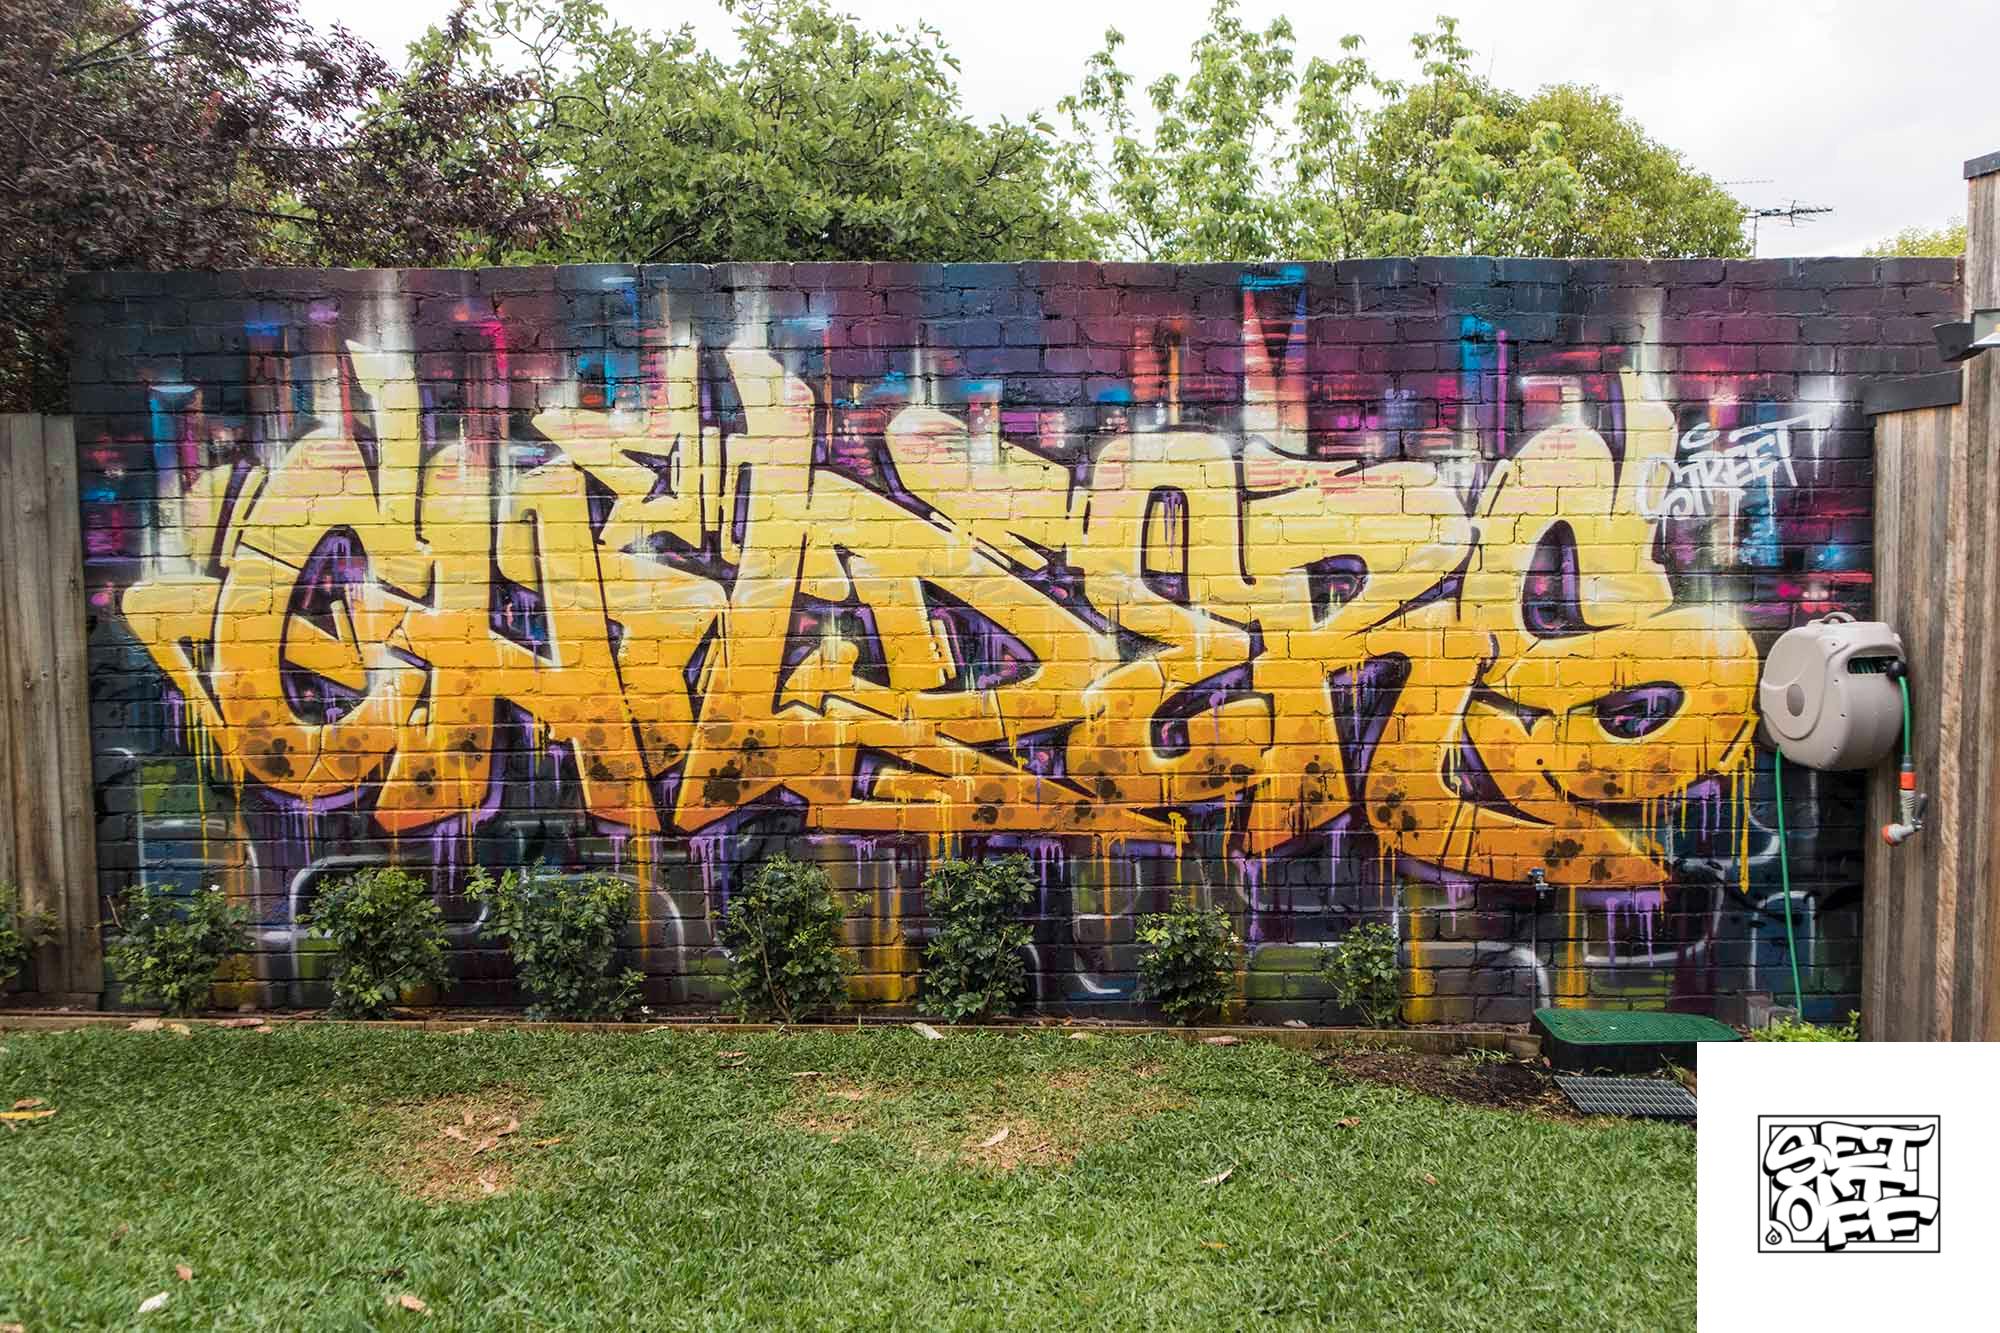 Mural artist Melbourne